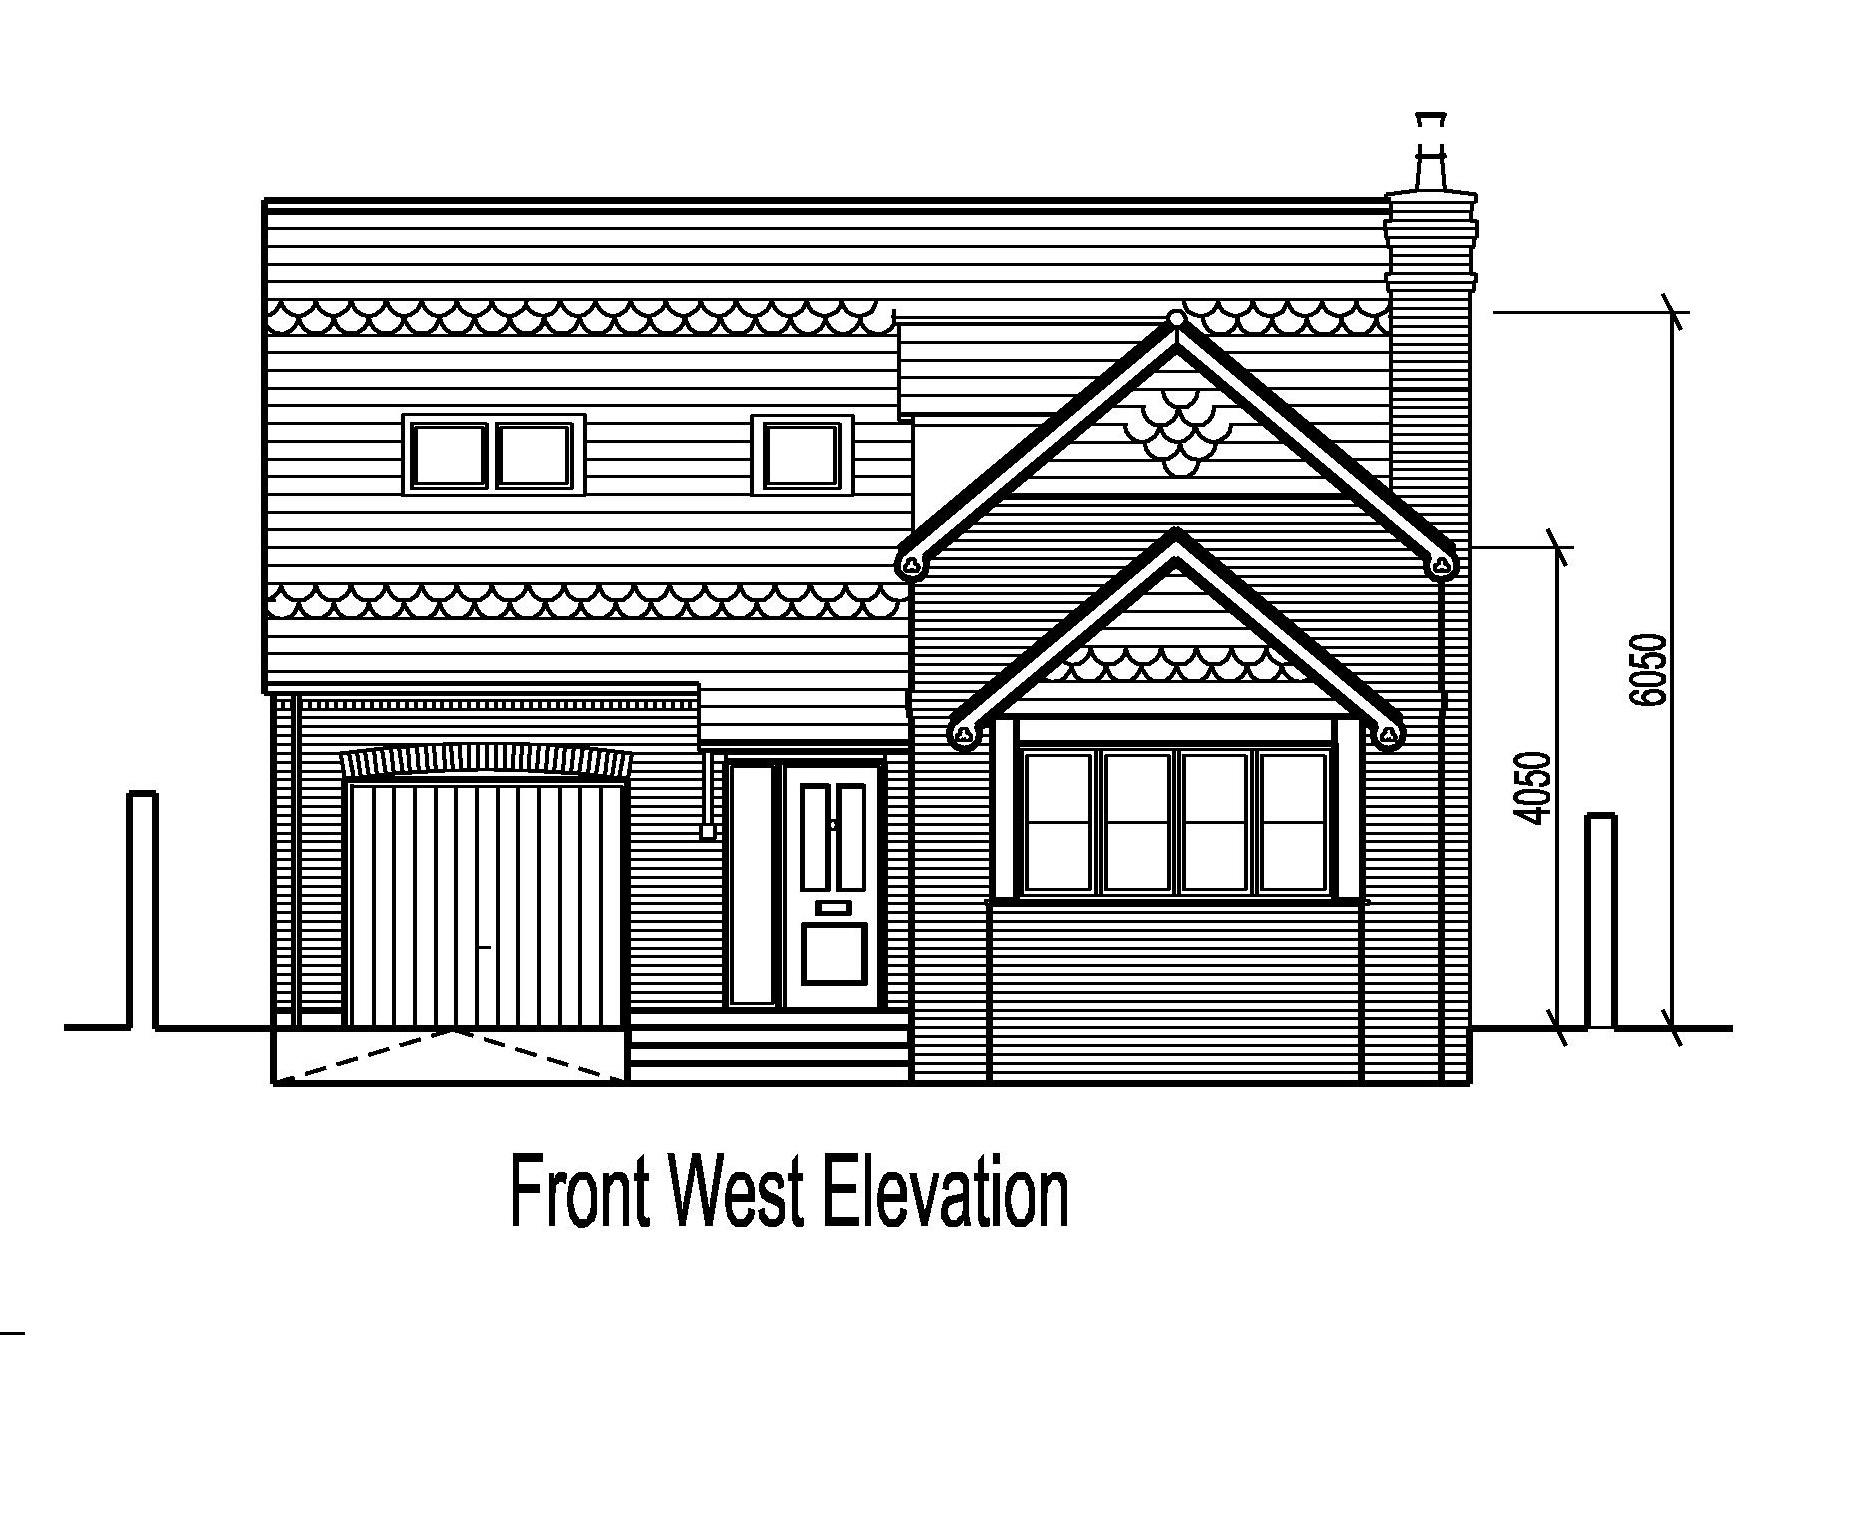 Front Elevation Planning Permission : Land in nottingham building plot at main street sdl